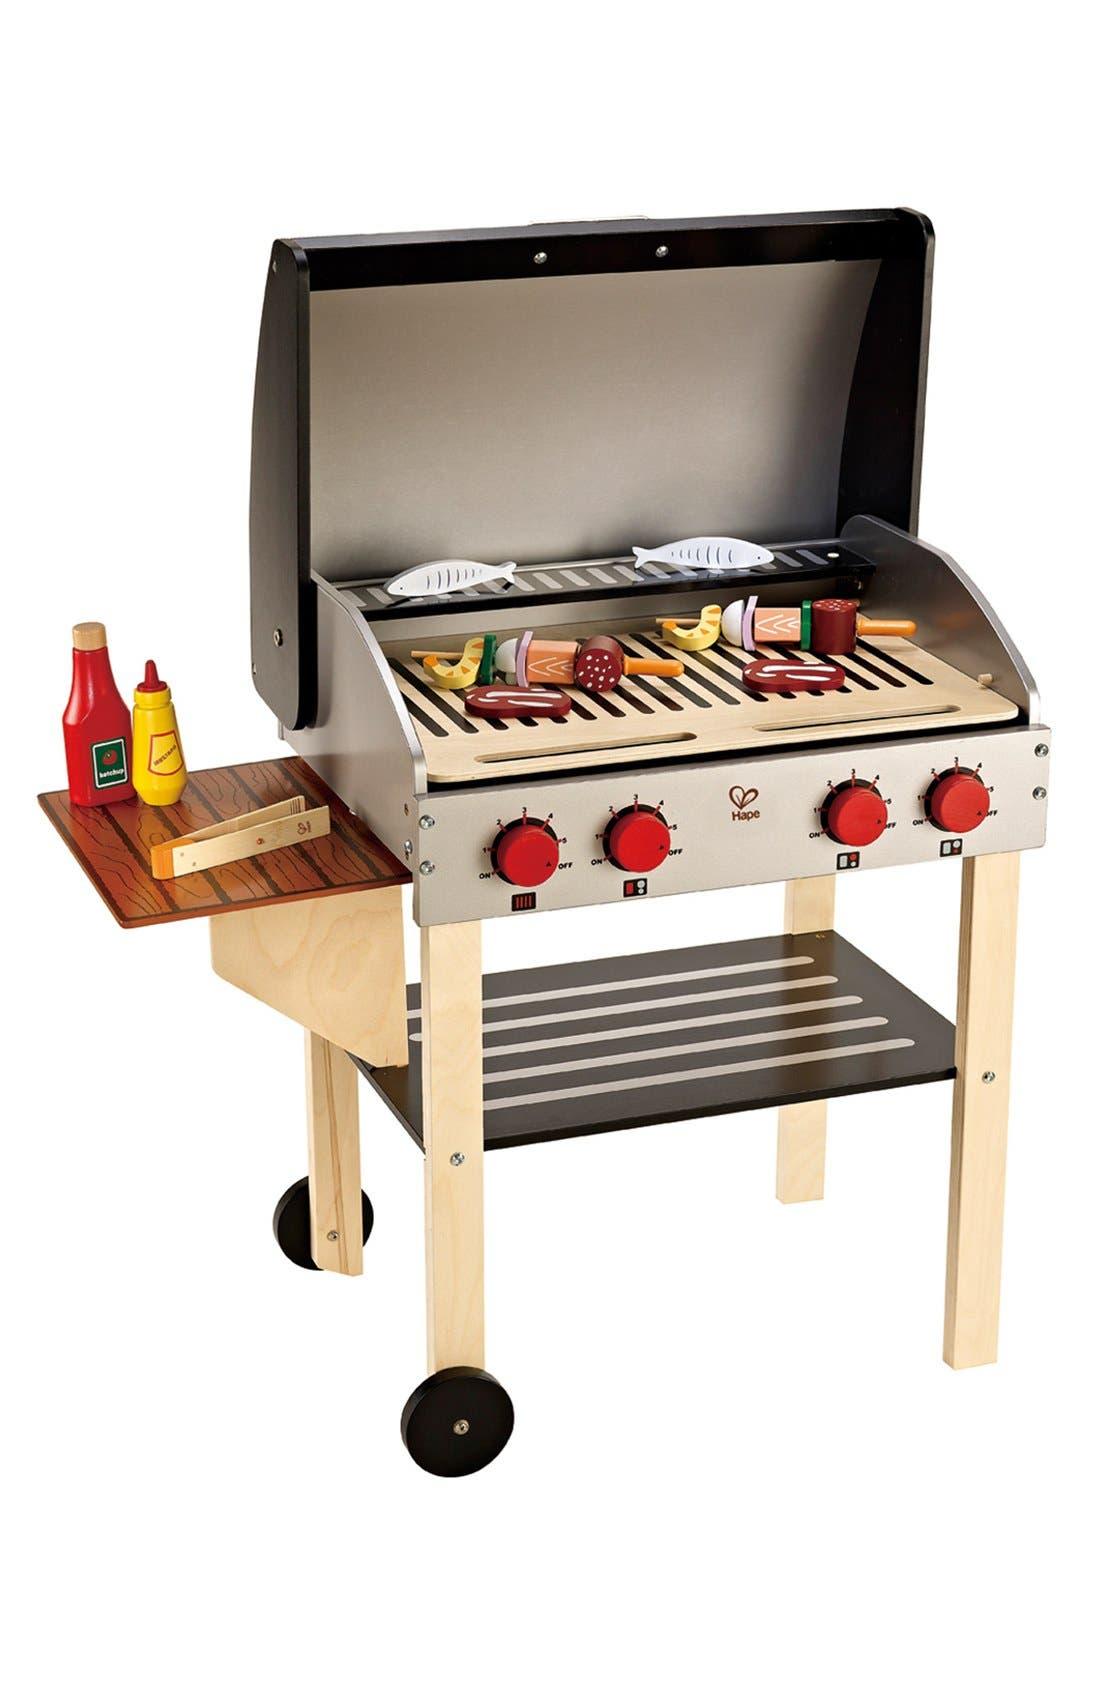 Main Image - Hape Gourmet Grill & Shish Kabob Play Set